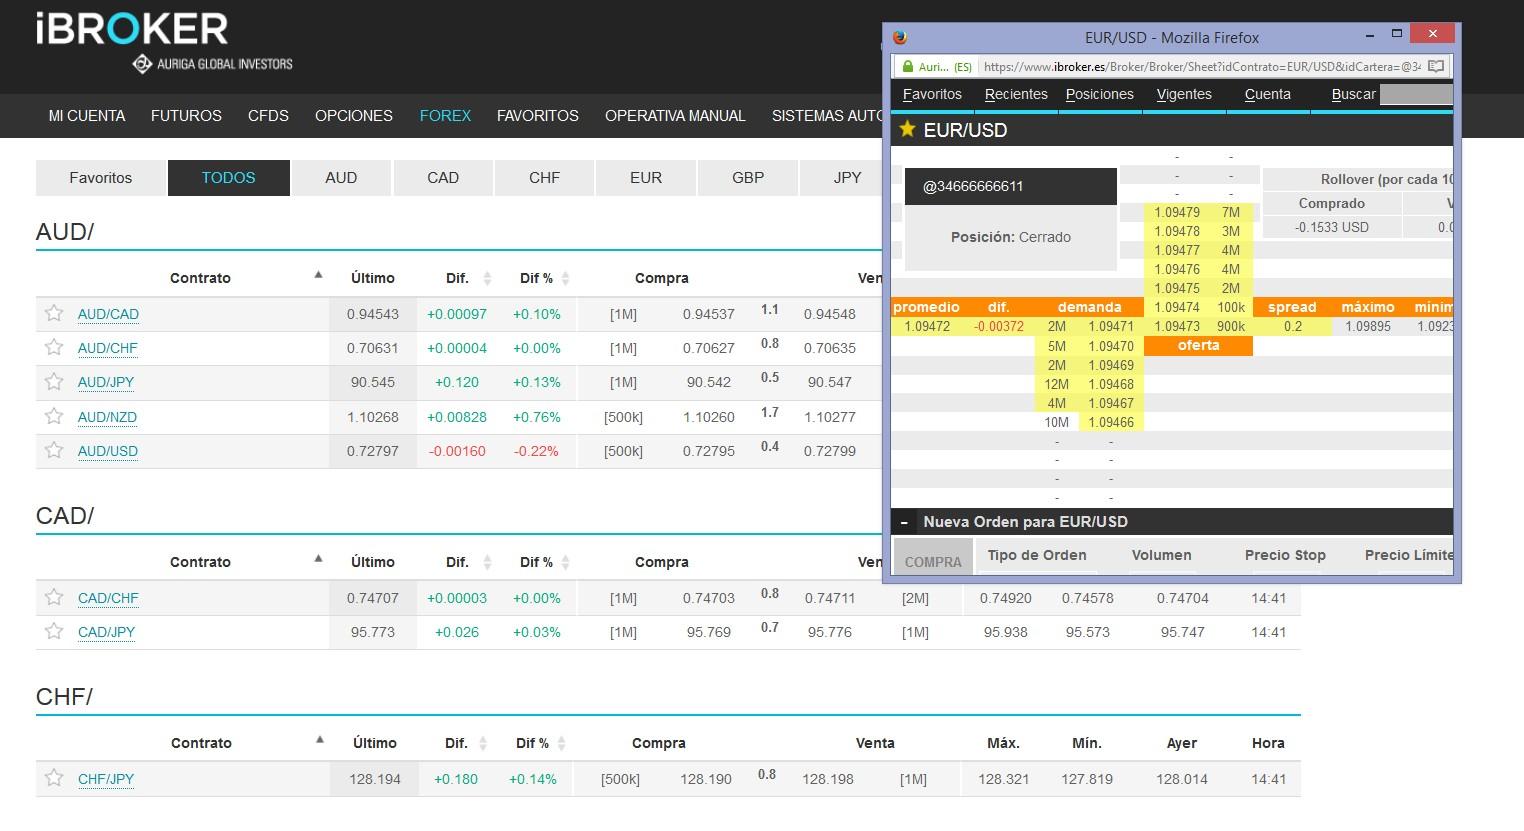 Comparaison de broker forex